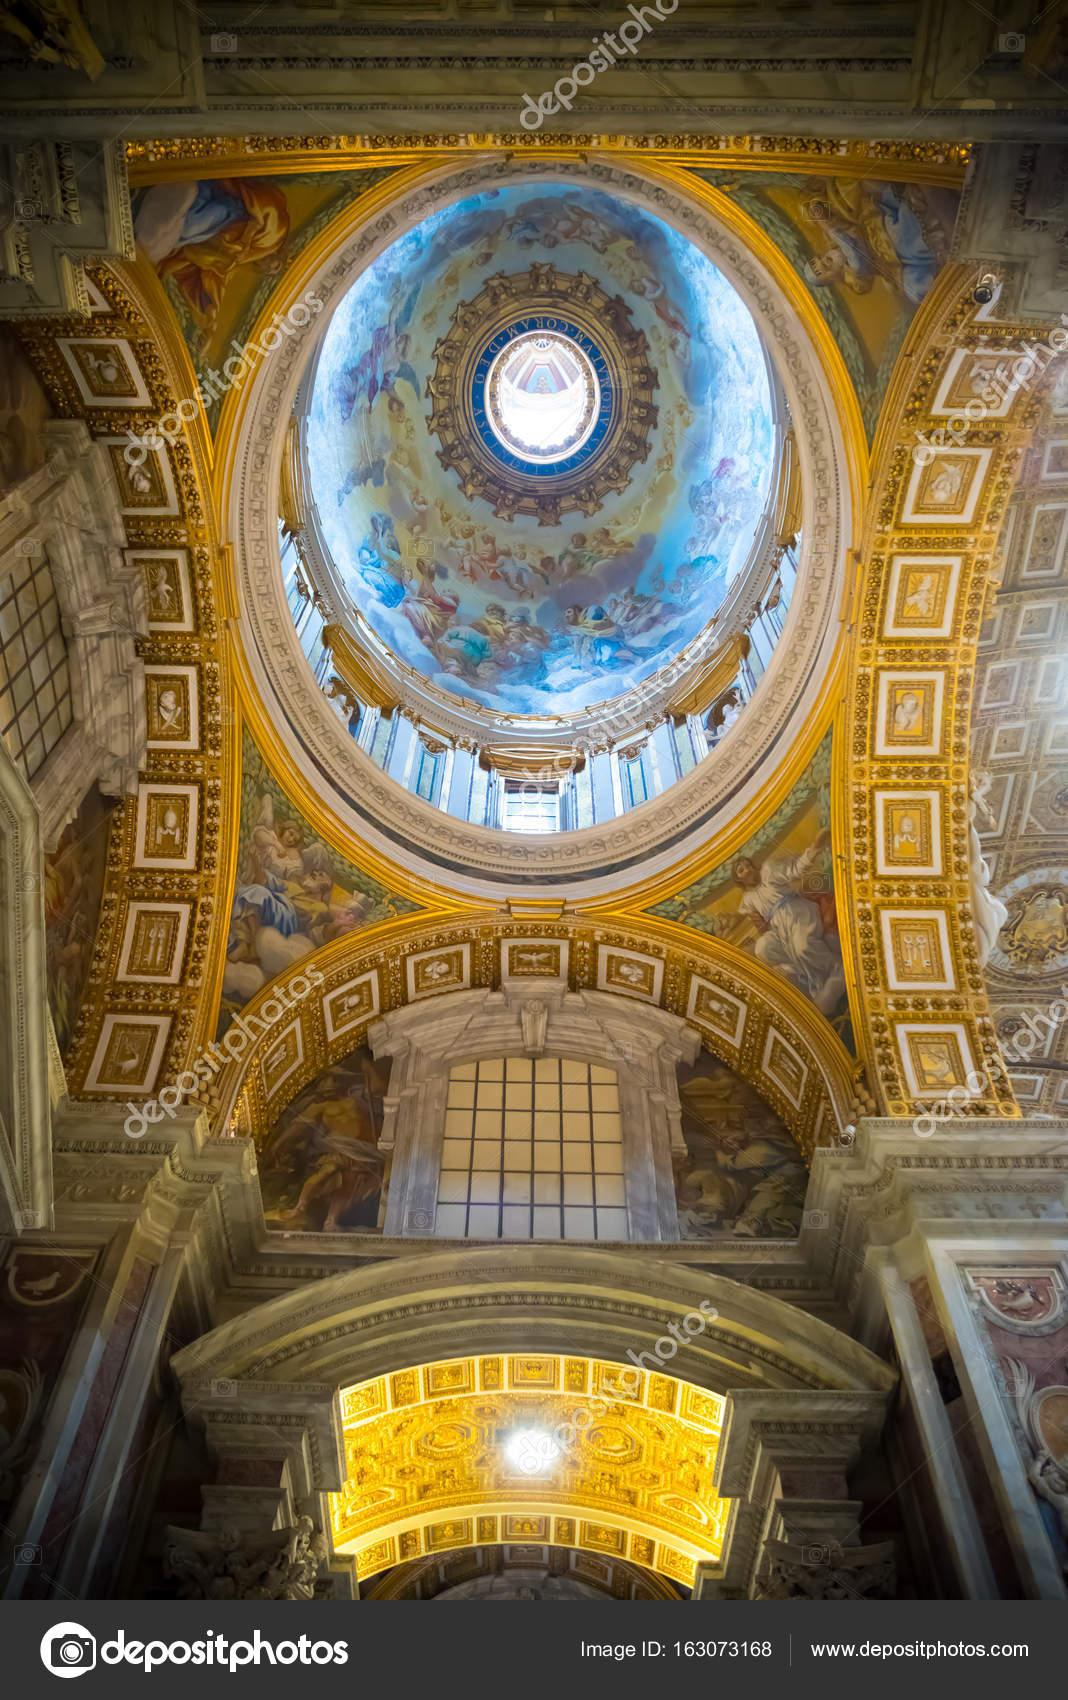 https://st3.depositphotos.com/1279189/16307/i/1600/depositphotos_163073168-stock-photo-st-peters-basilica-interior.jpg